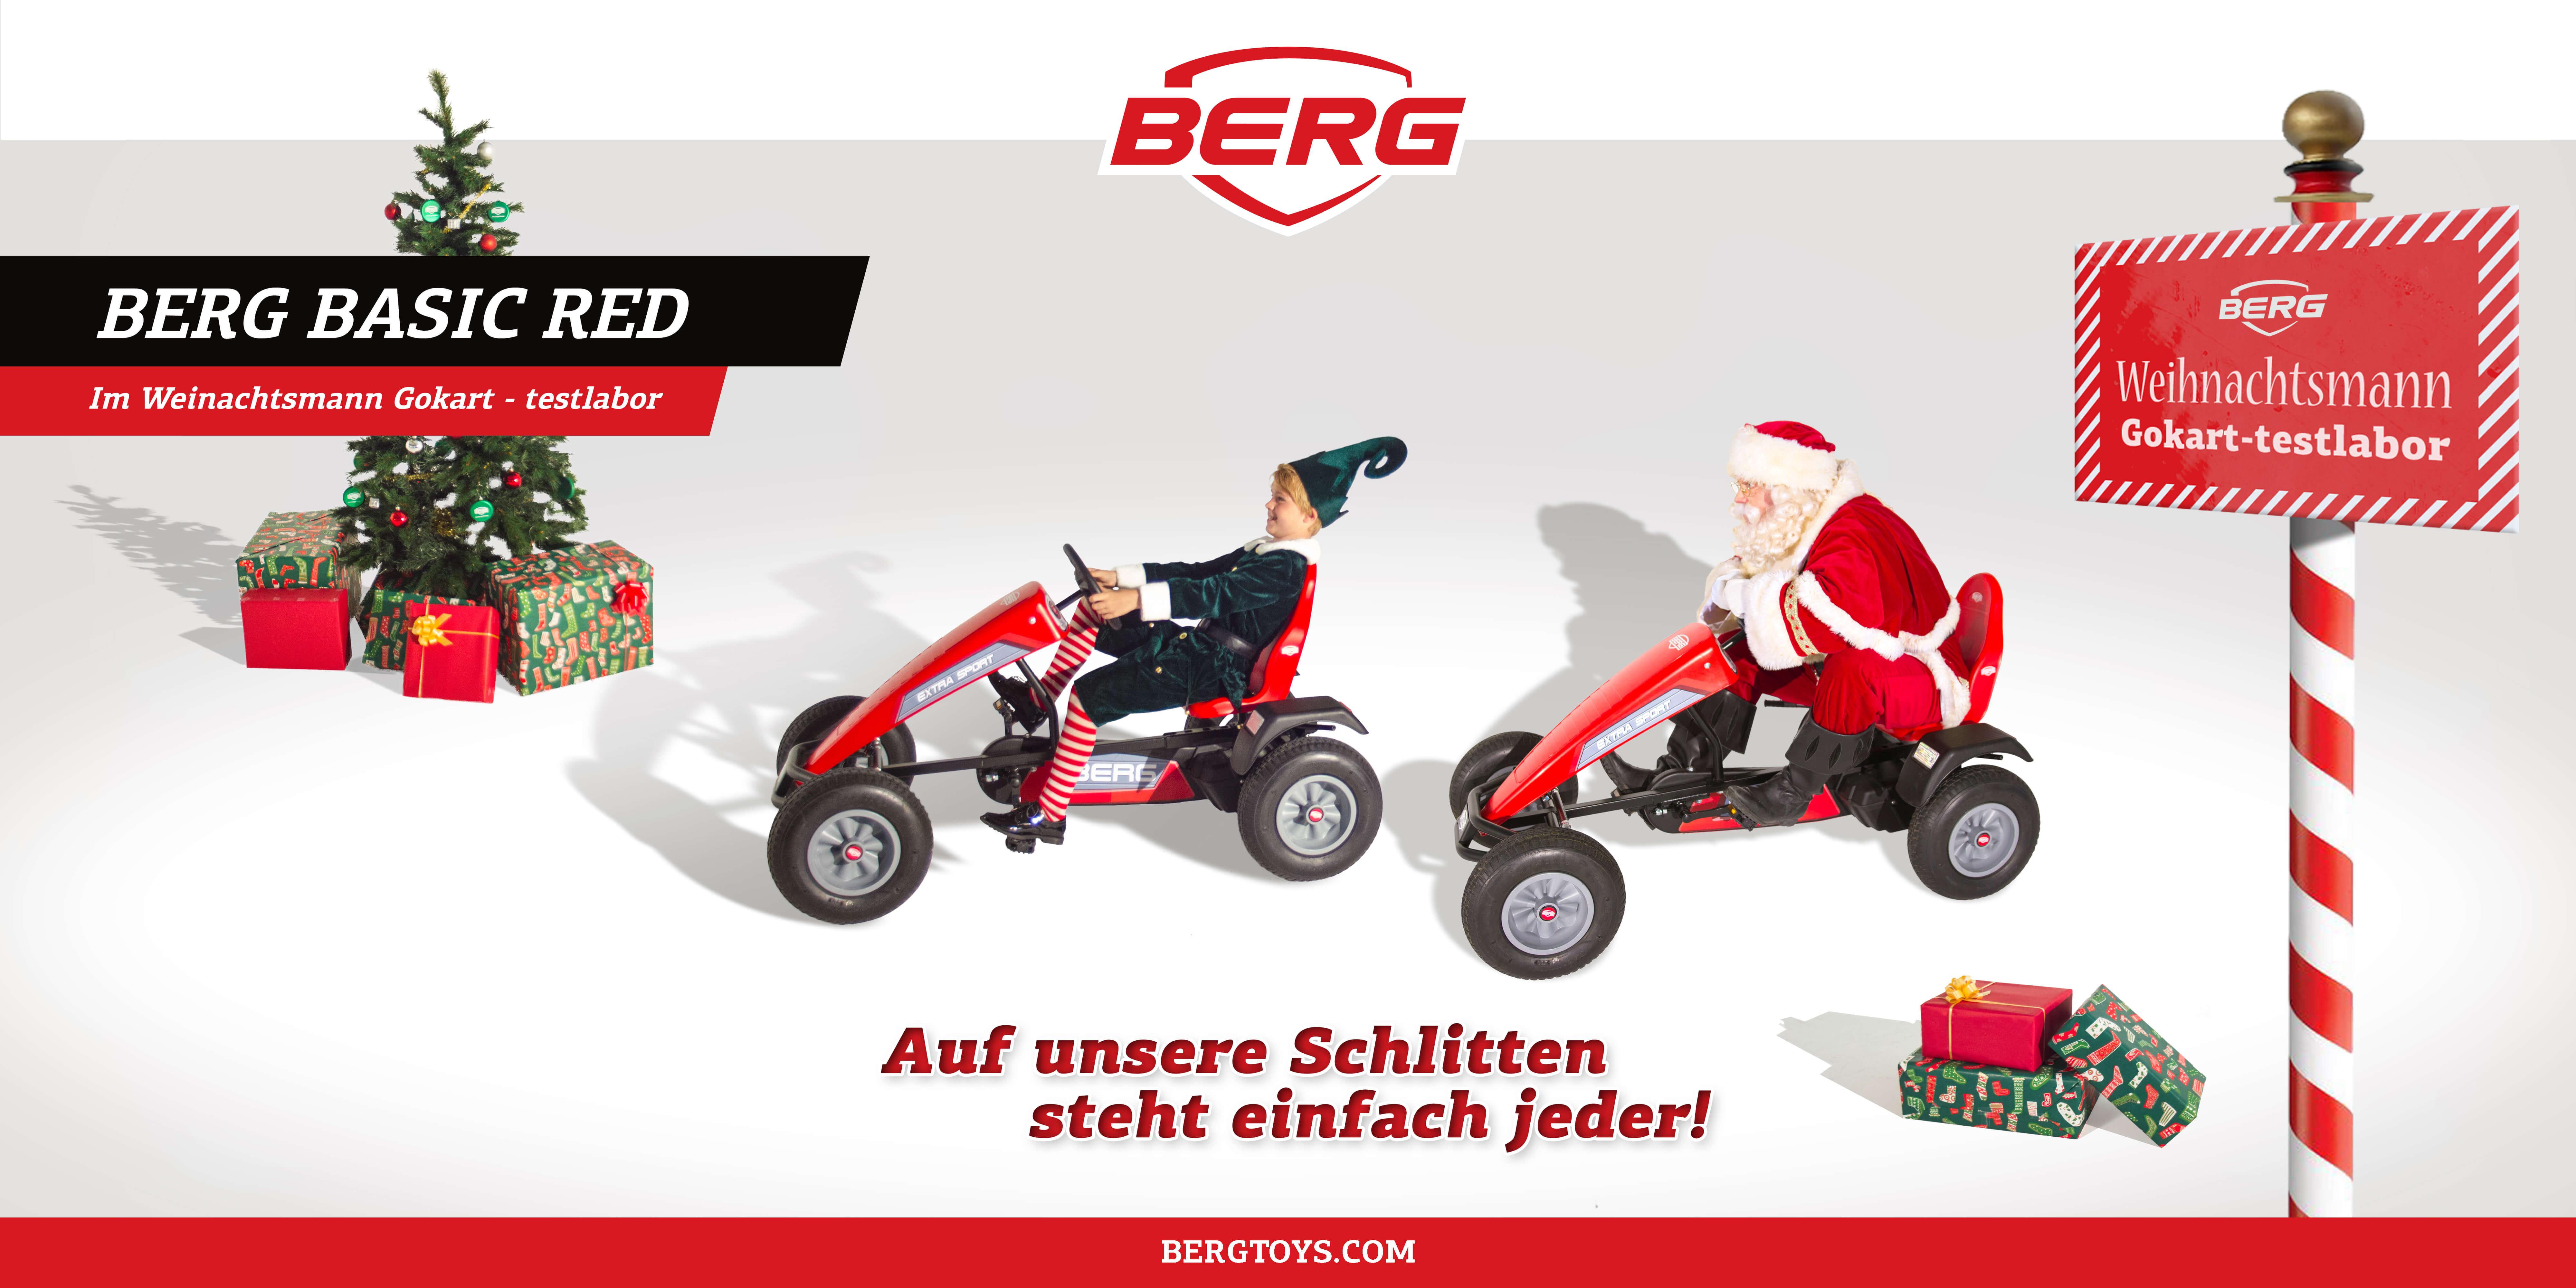 Lustig, lustig, Tralalalala – der Nikolaus ist mit dem Gokart da - gokart-profi.de